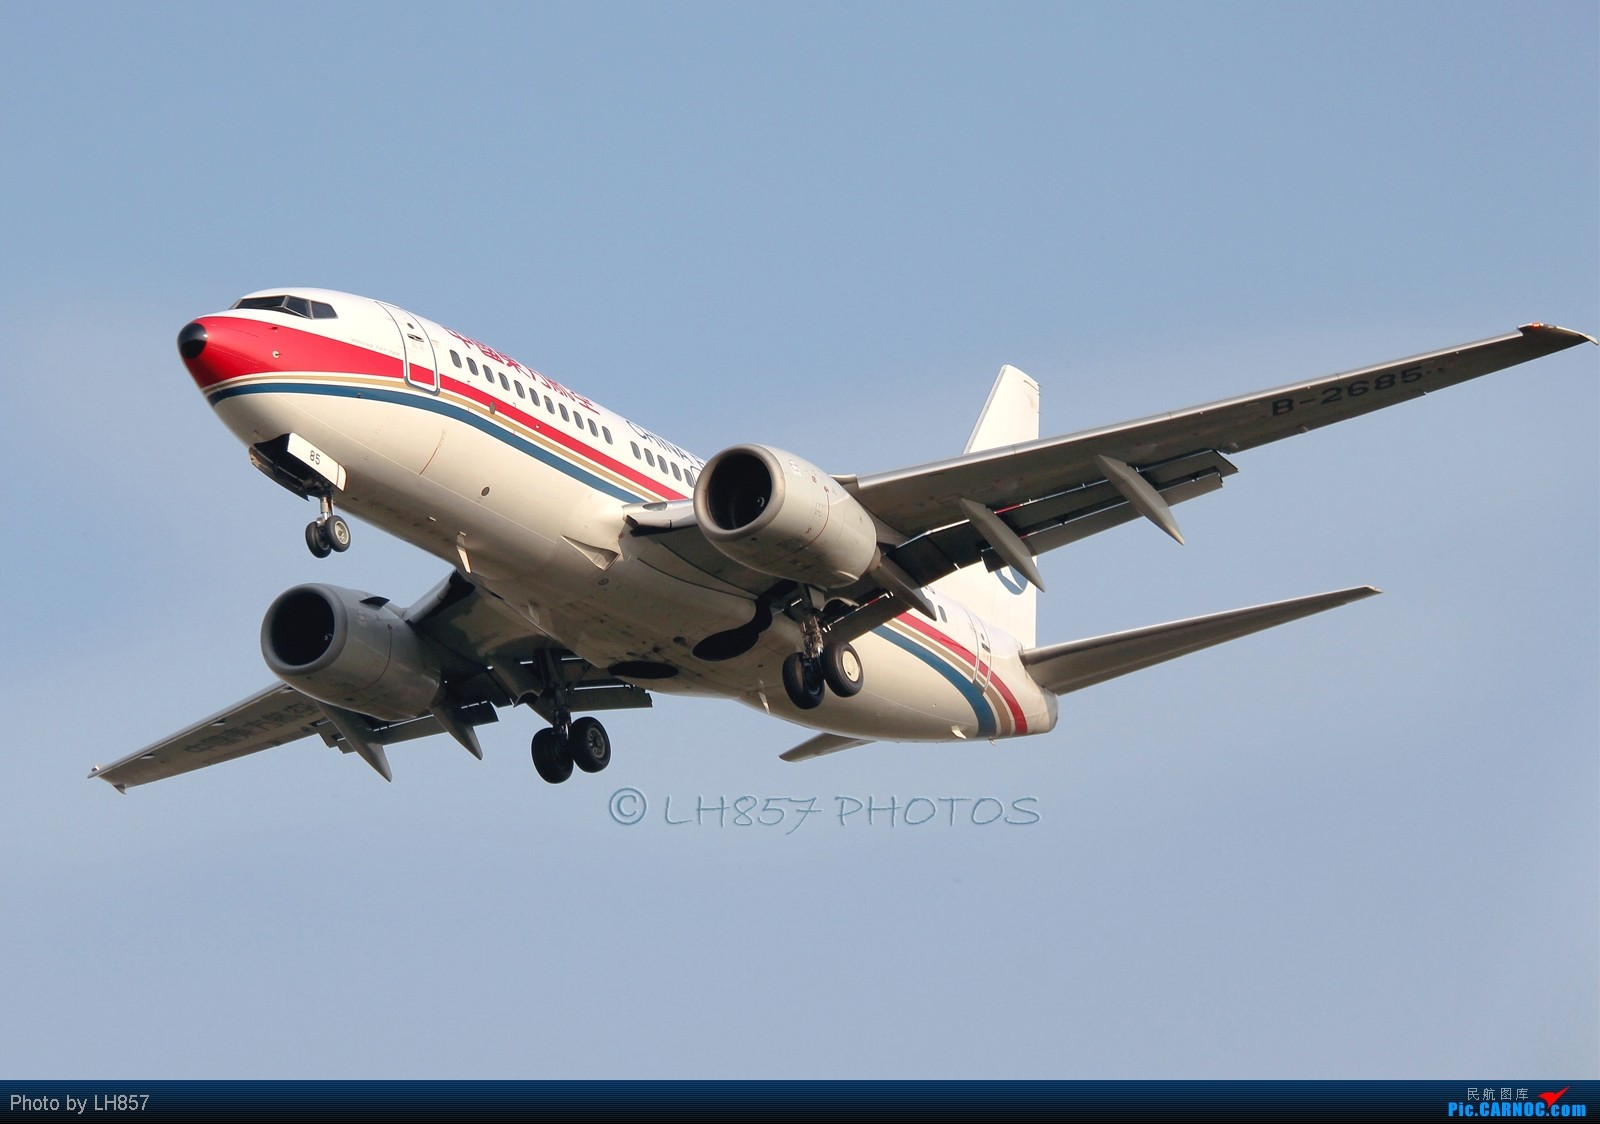 Re:[原创]好天气下蛋疼的石家庄总是有亮点 1600大图 BOEING 737-700 B-2685 中国石家庄正定机场